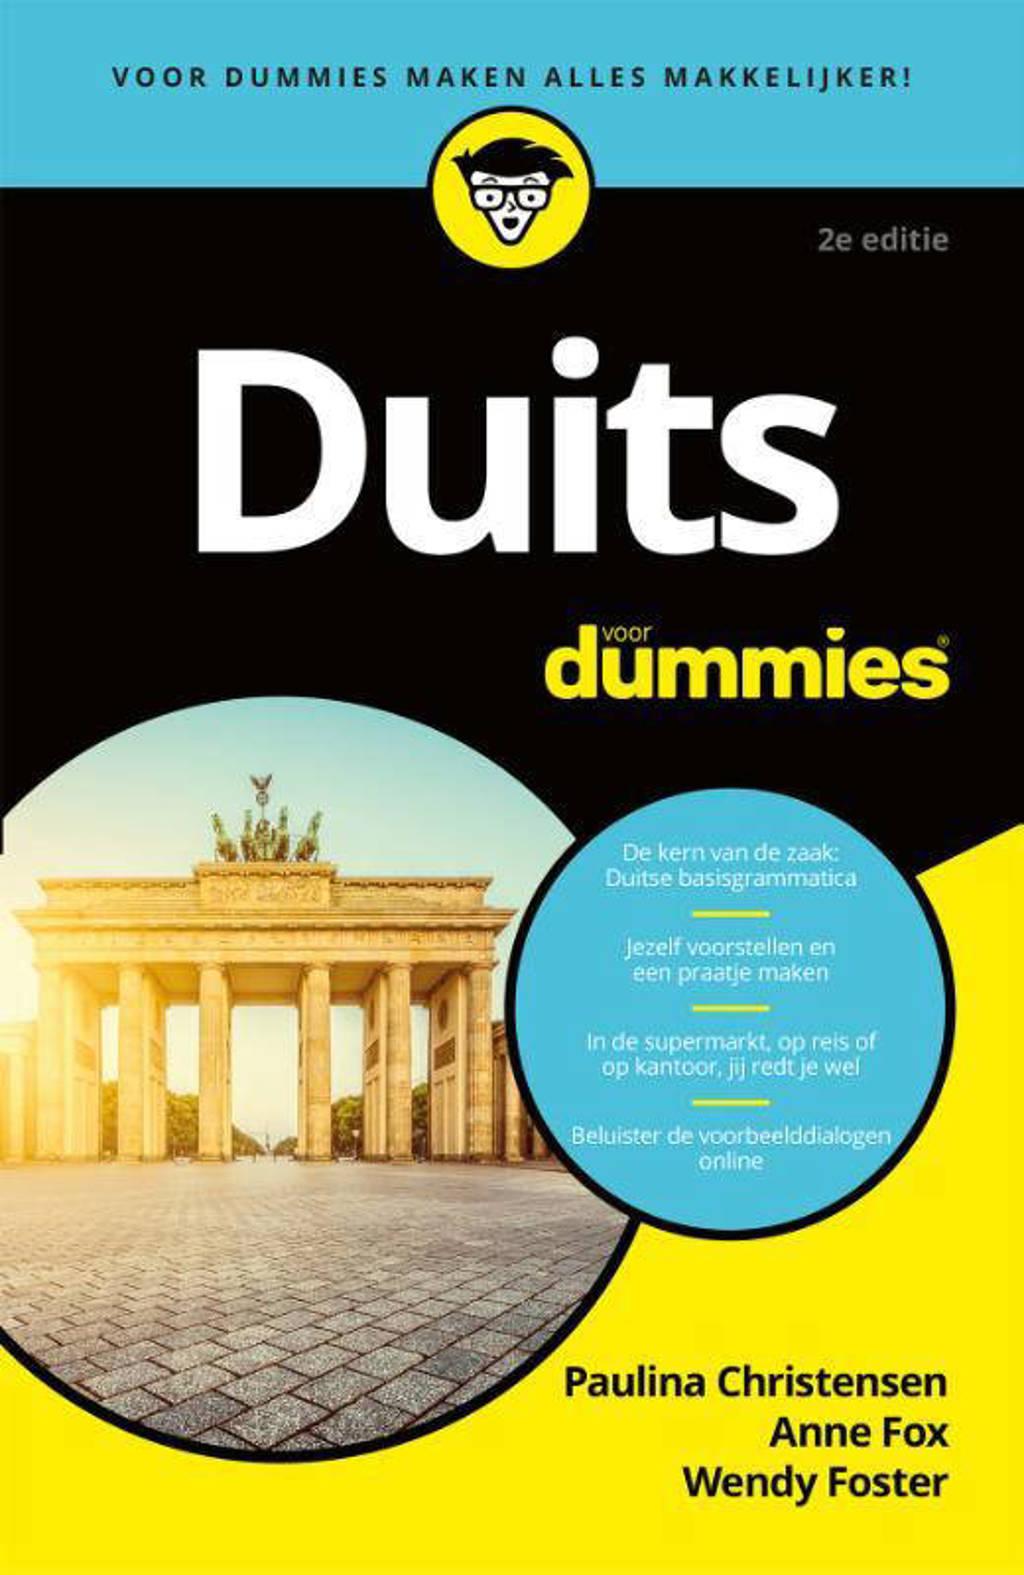 Duits voor Dummies - Paulina Christensen, Anne Fox en Wendy Foster